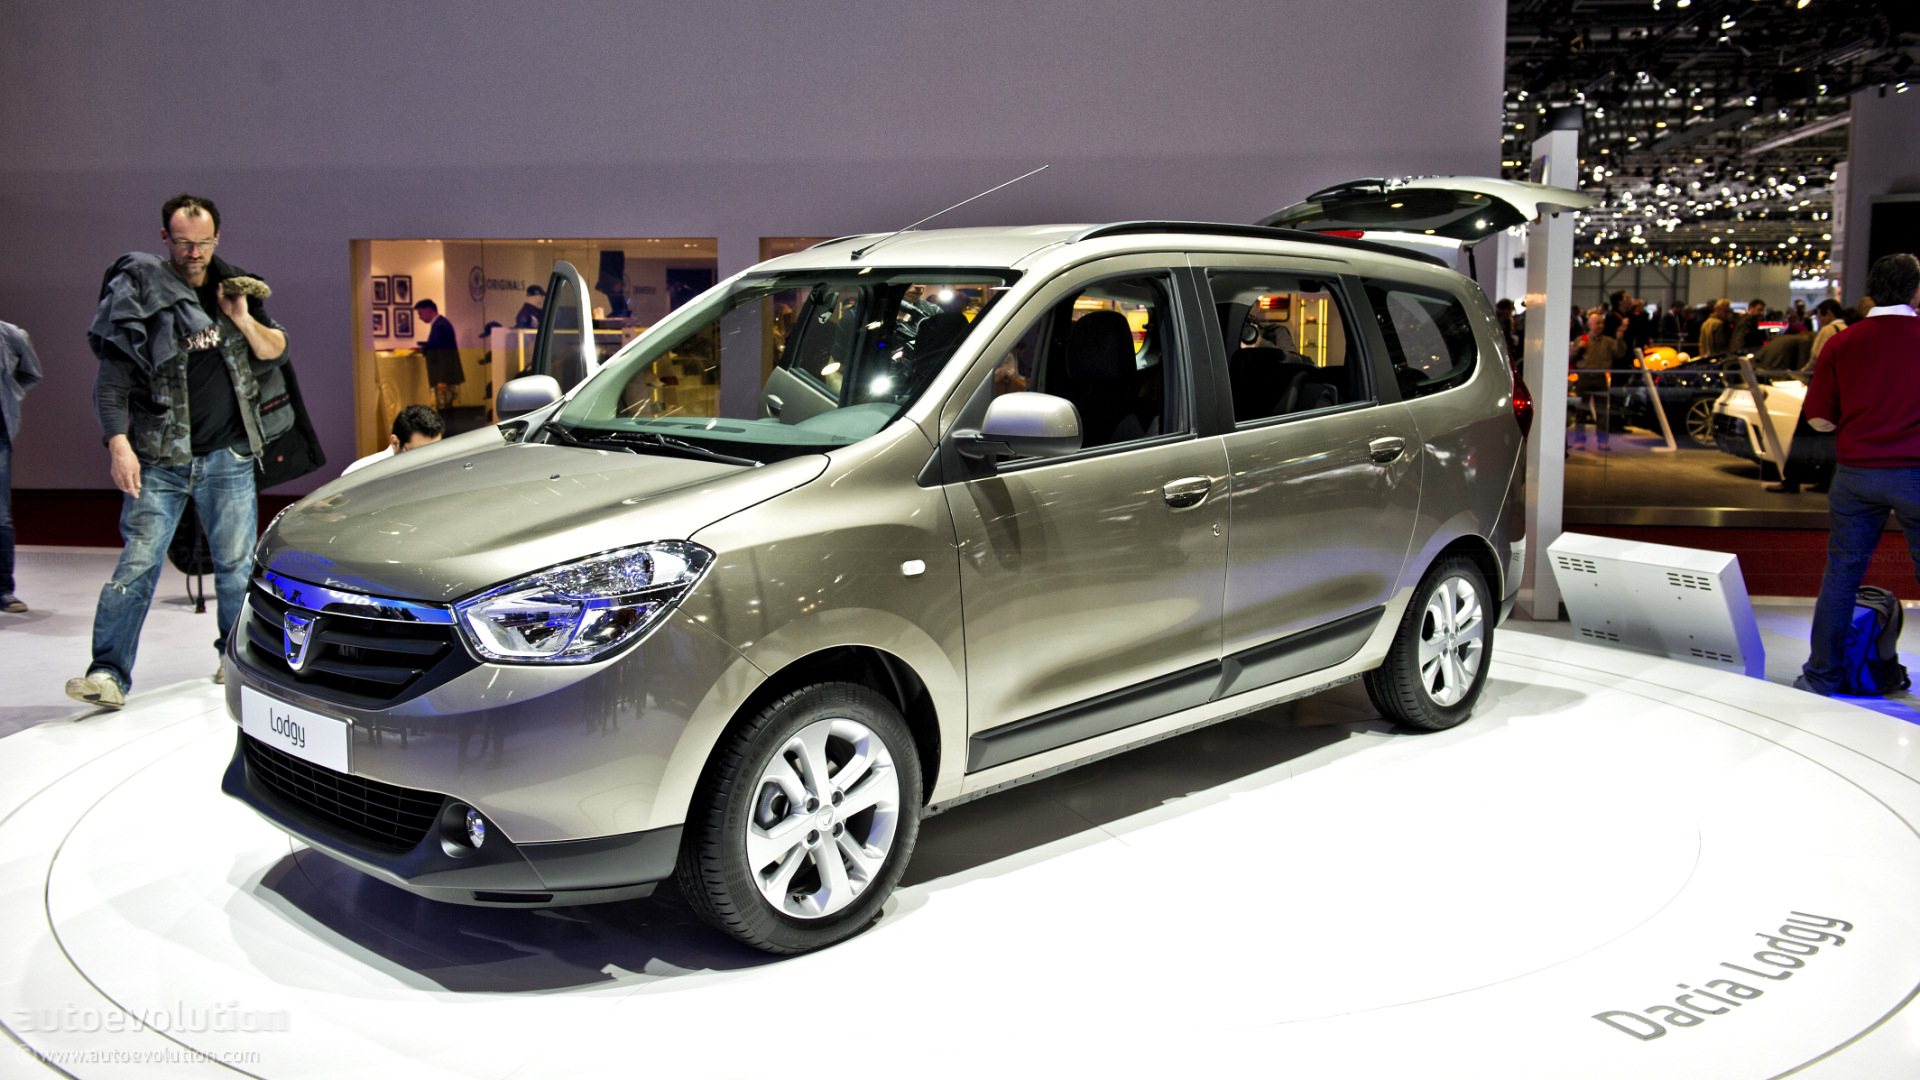 Dacia Lodgy: Geneva 2012: Dacia Lodgy Official Reveal [Live Photos